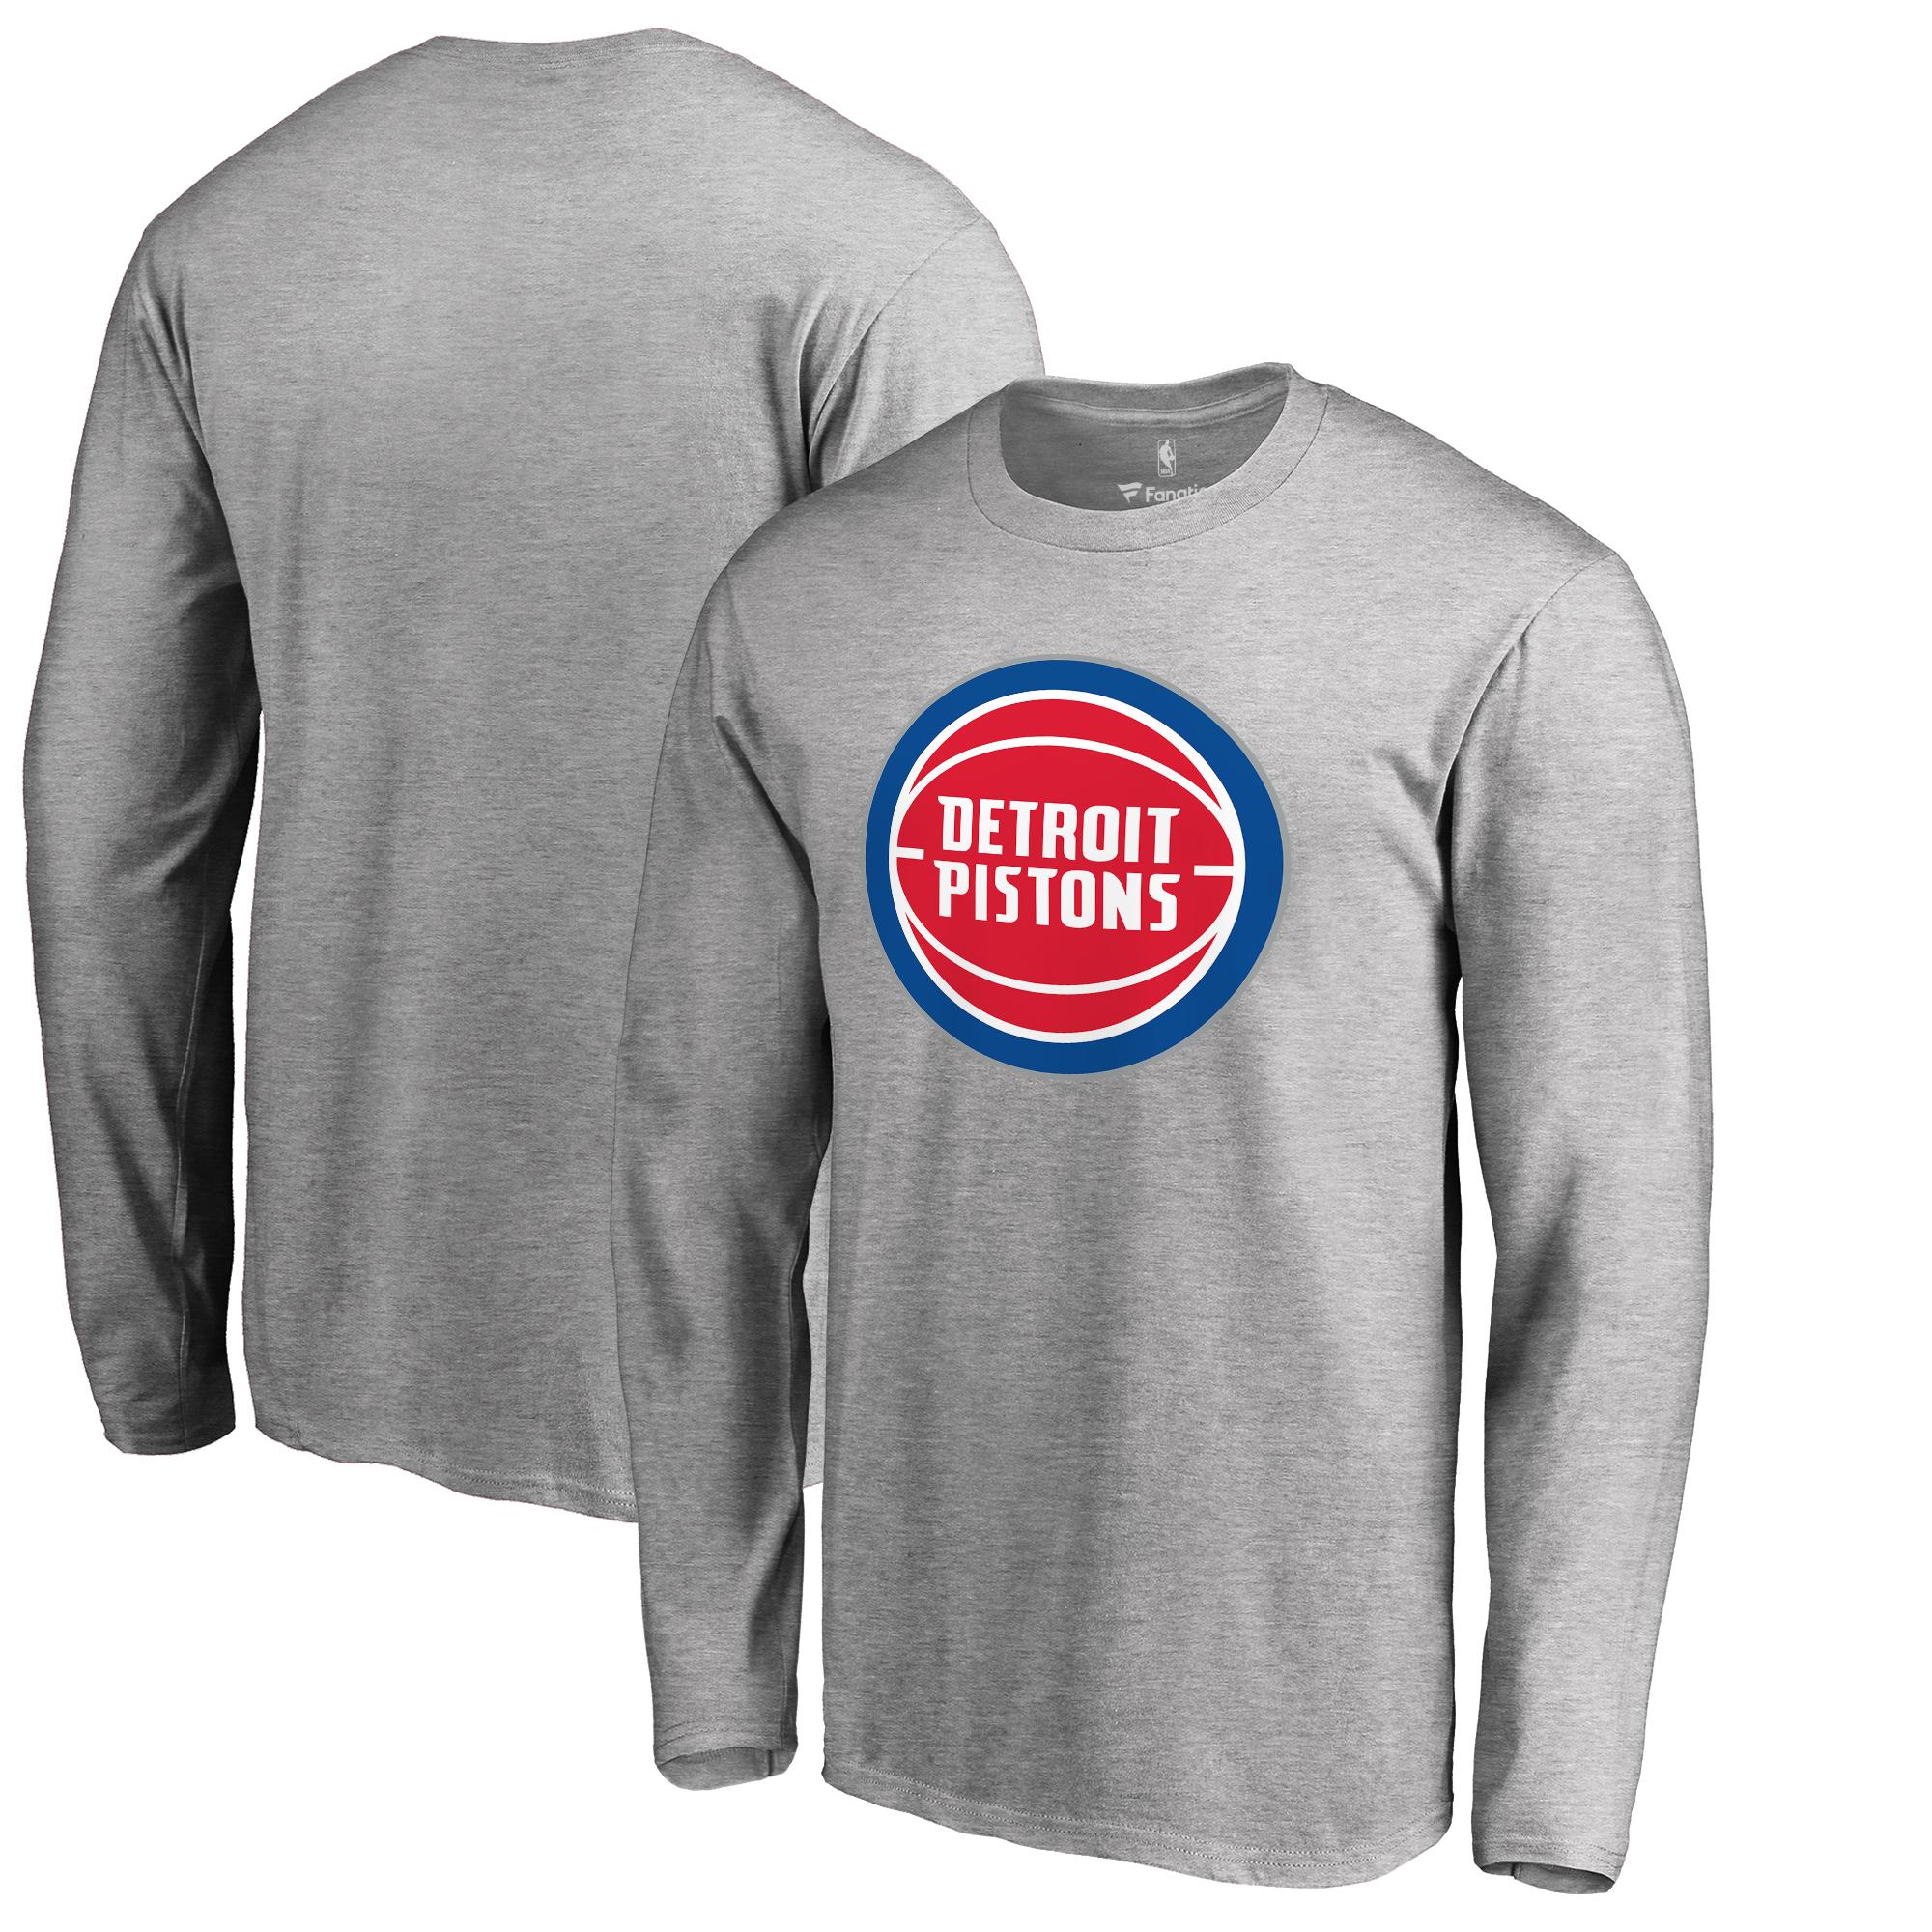 Detroit Pistons Fanatics Branded Primary Logo Long Sleeve T-Shirt - Heather Gray